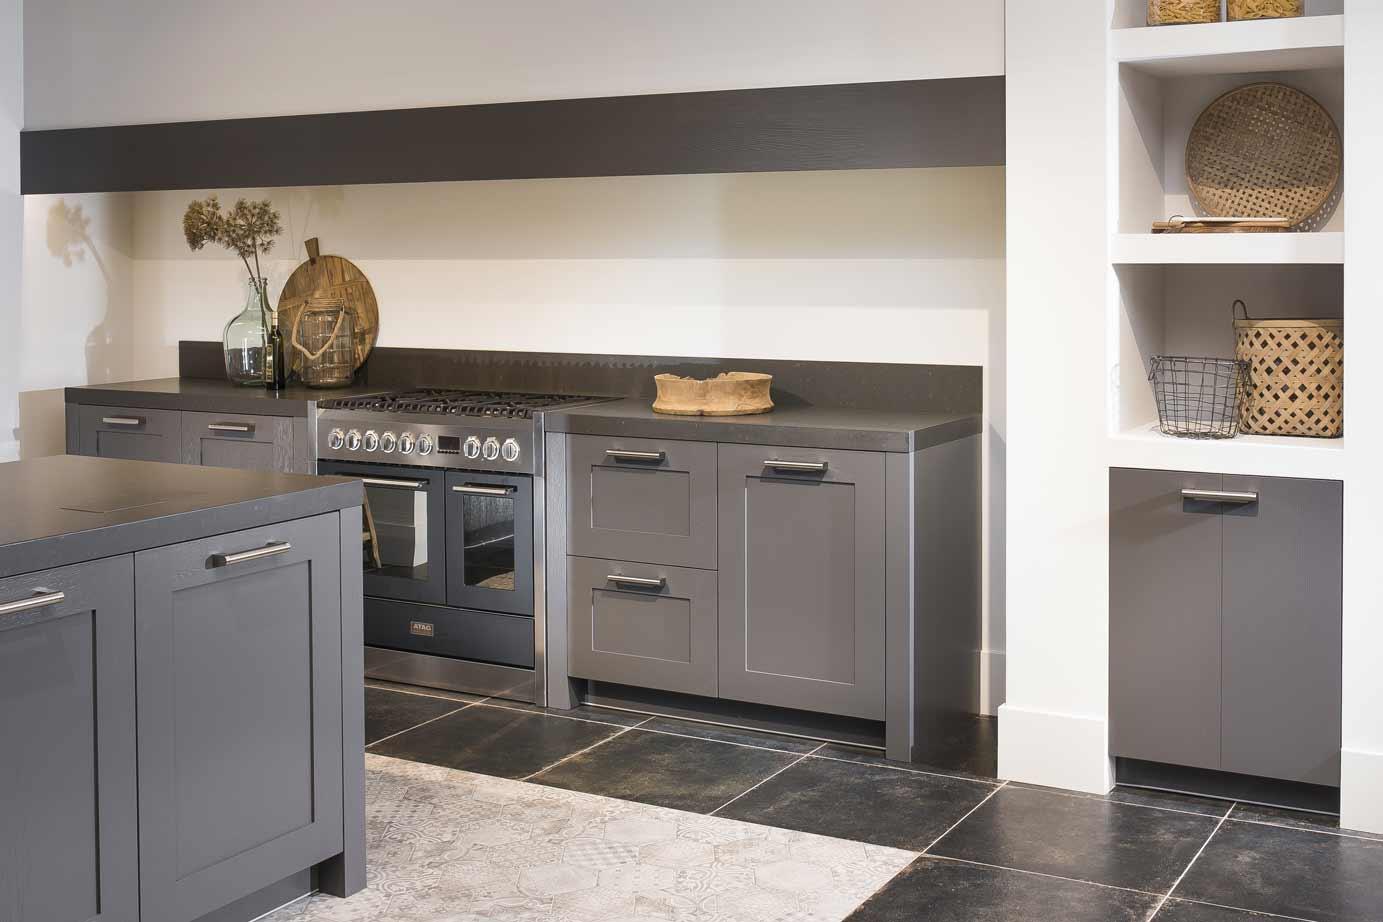 Moderne Keuken Grijs : Moderne keuken great moderne keuken in antraciet with moderne